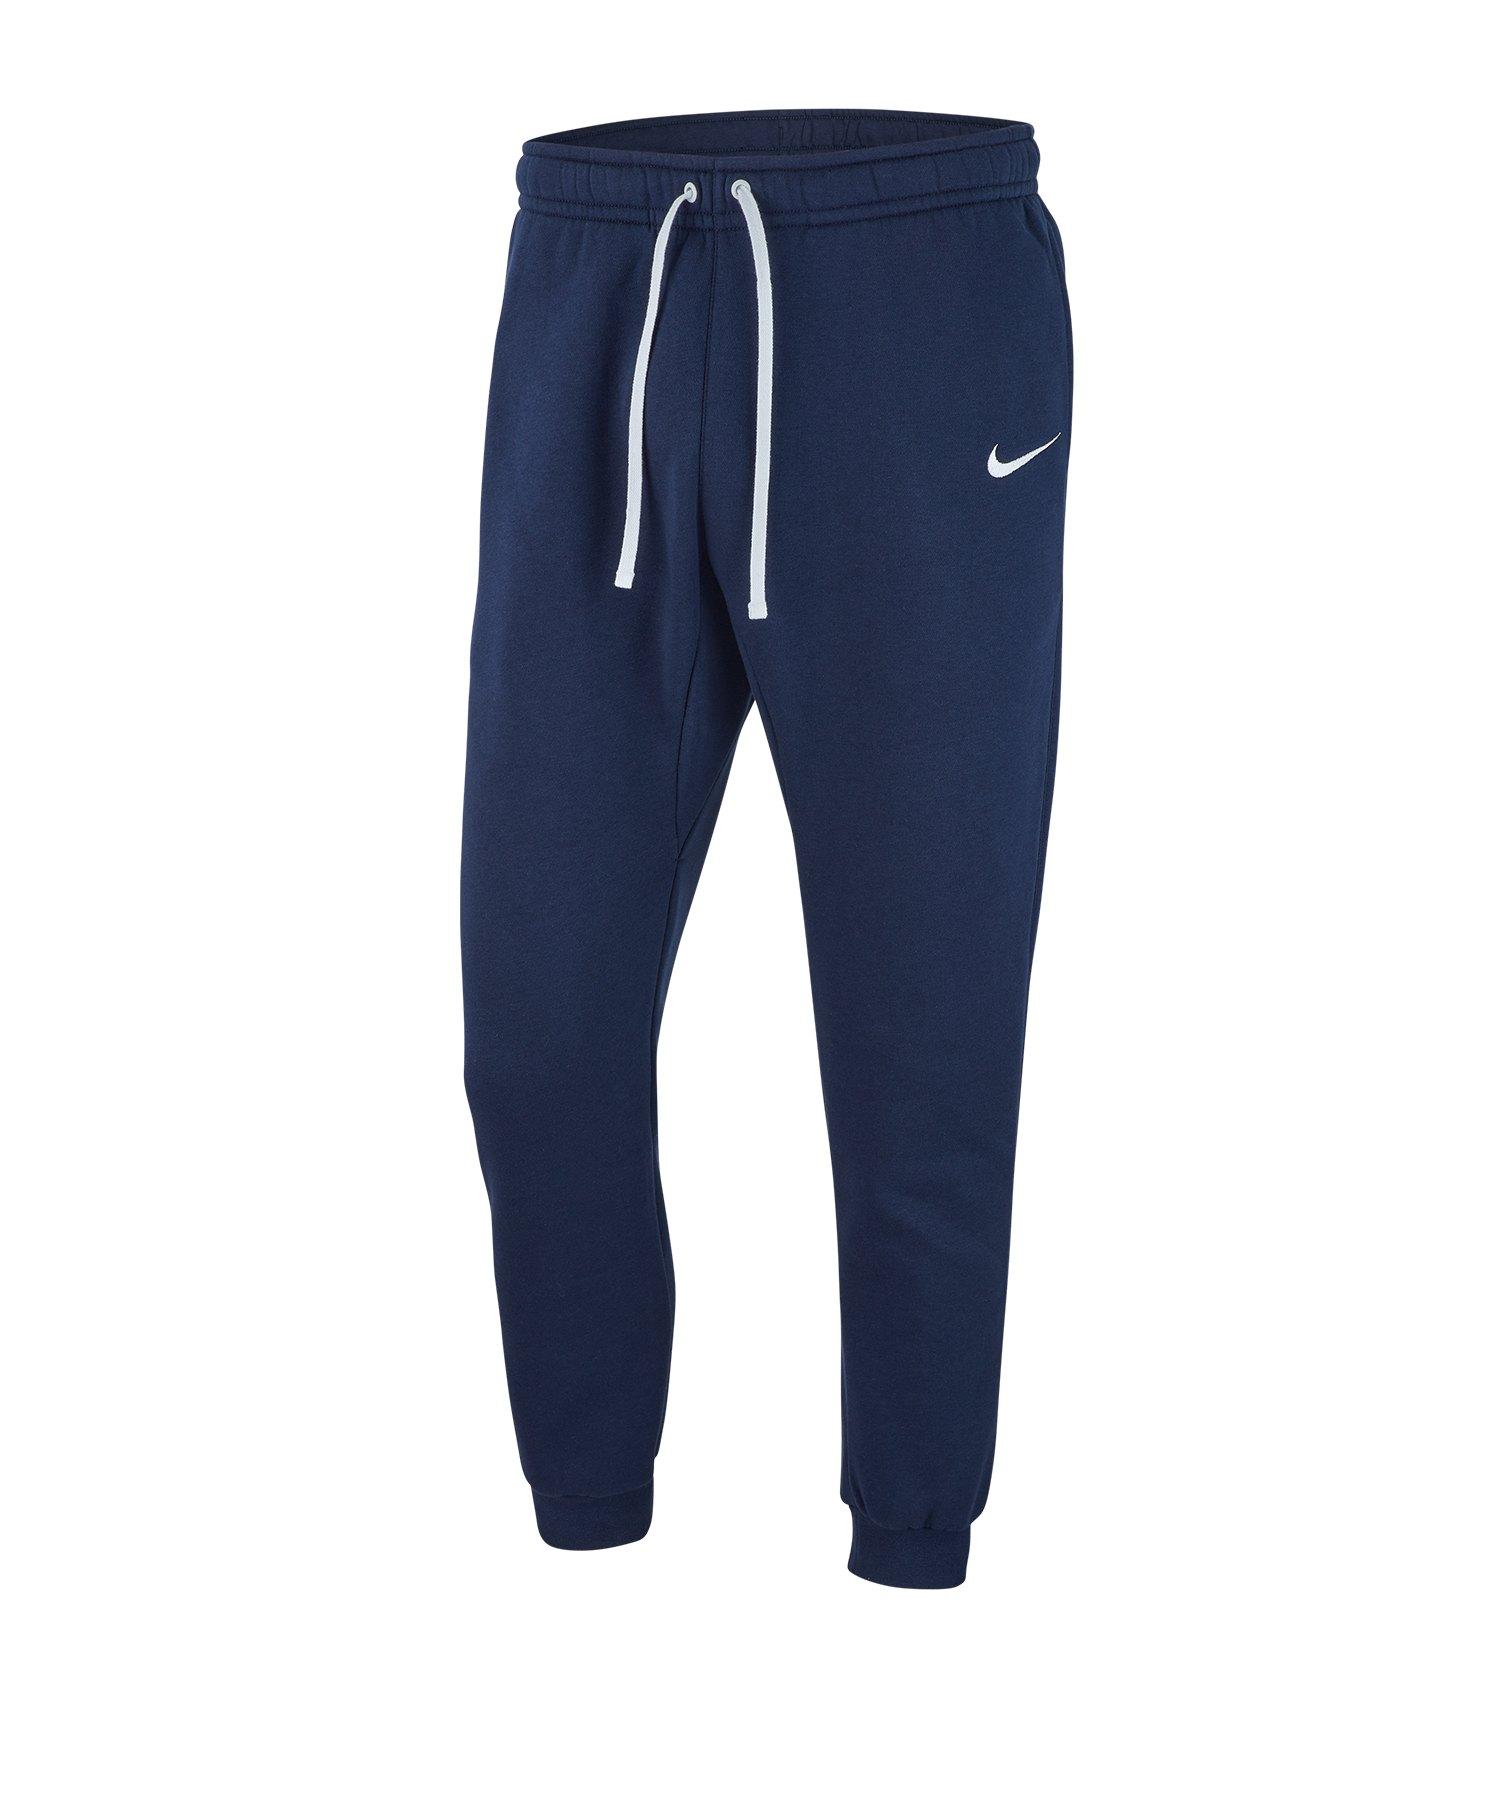 Nike Team Club 19 Fleece Jogginghose Blau F451 - blau